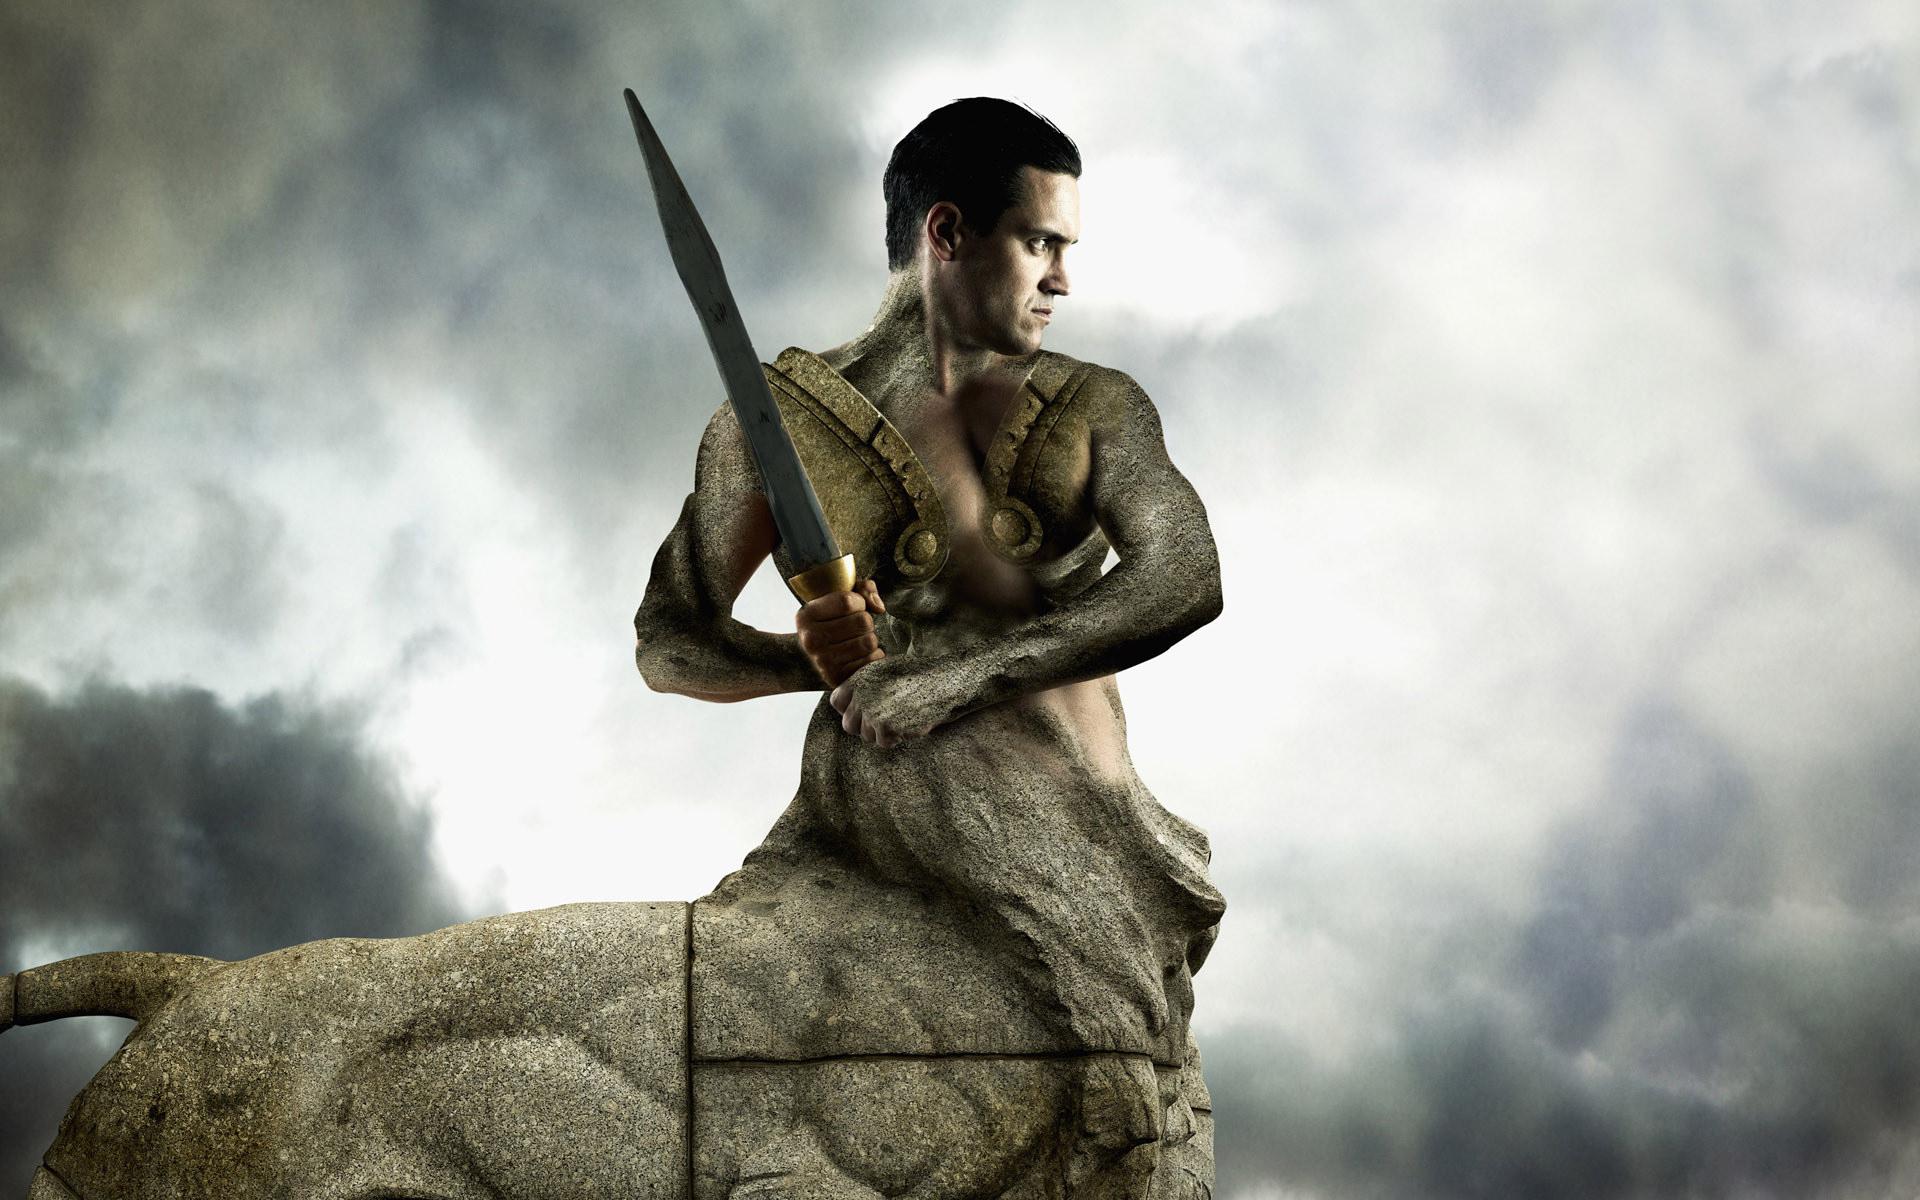 кентавр, тело лошади, каменное